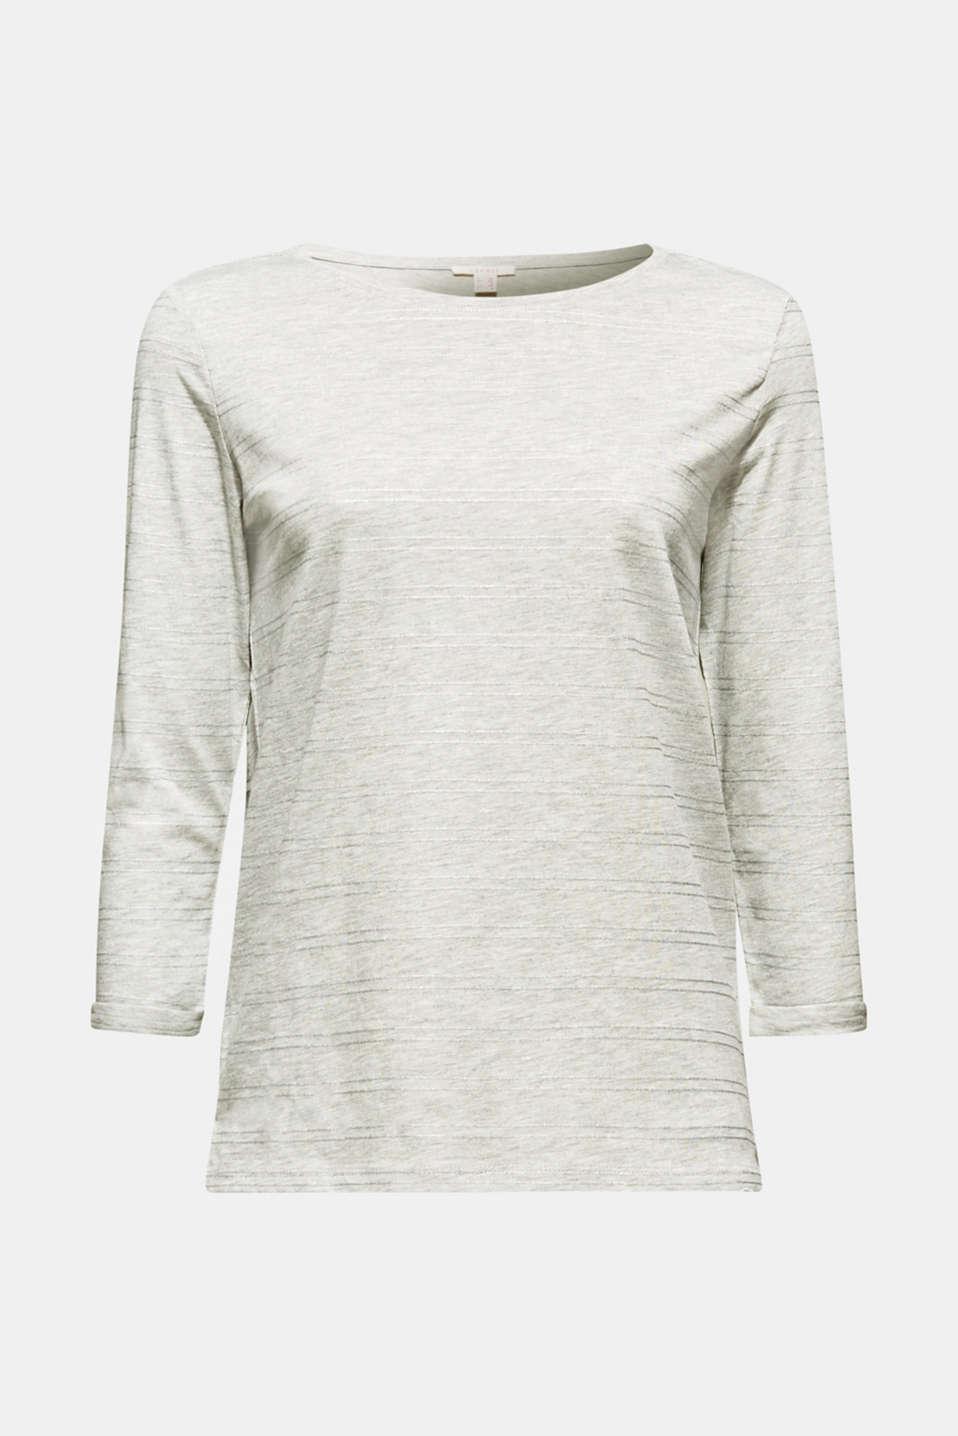 T-Shirts, LIGHT GREY 5, detail image number 6